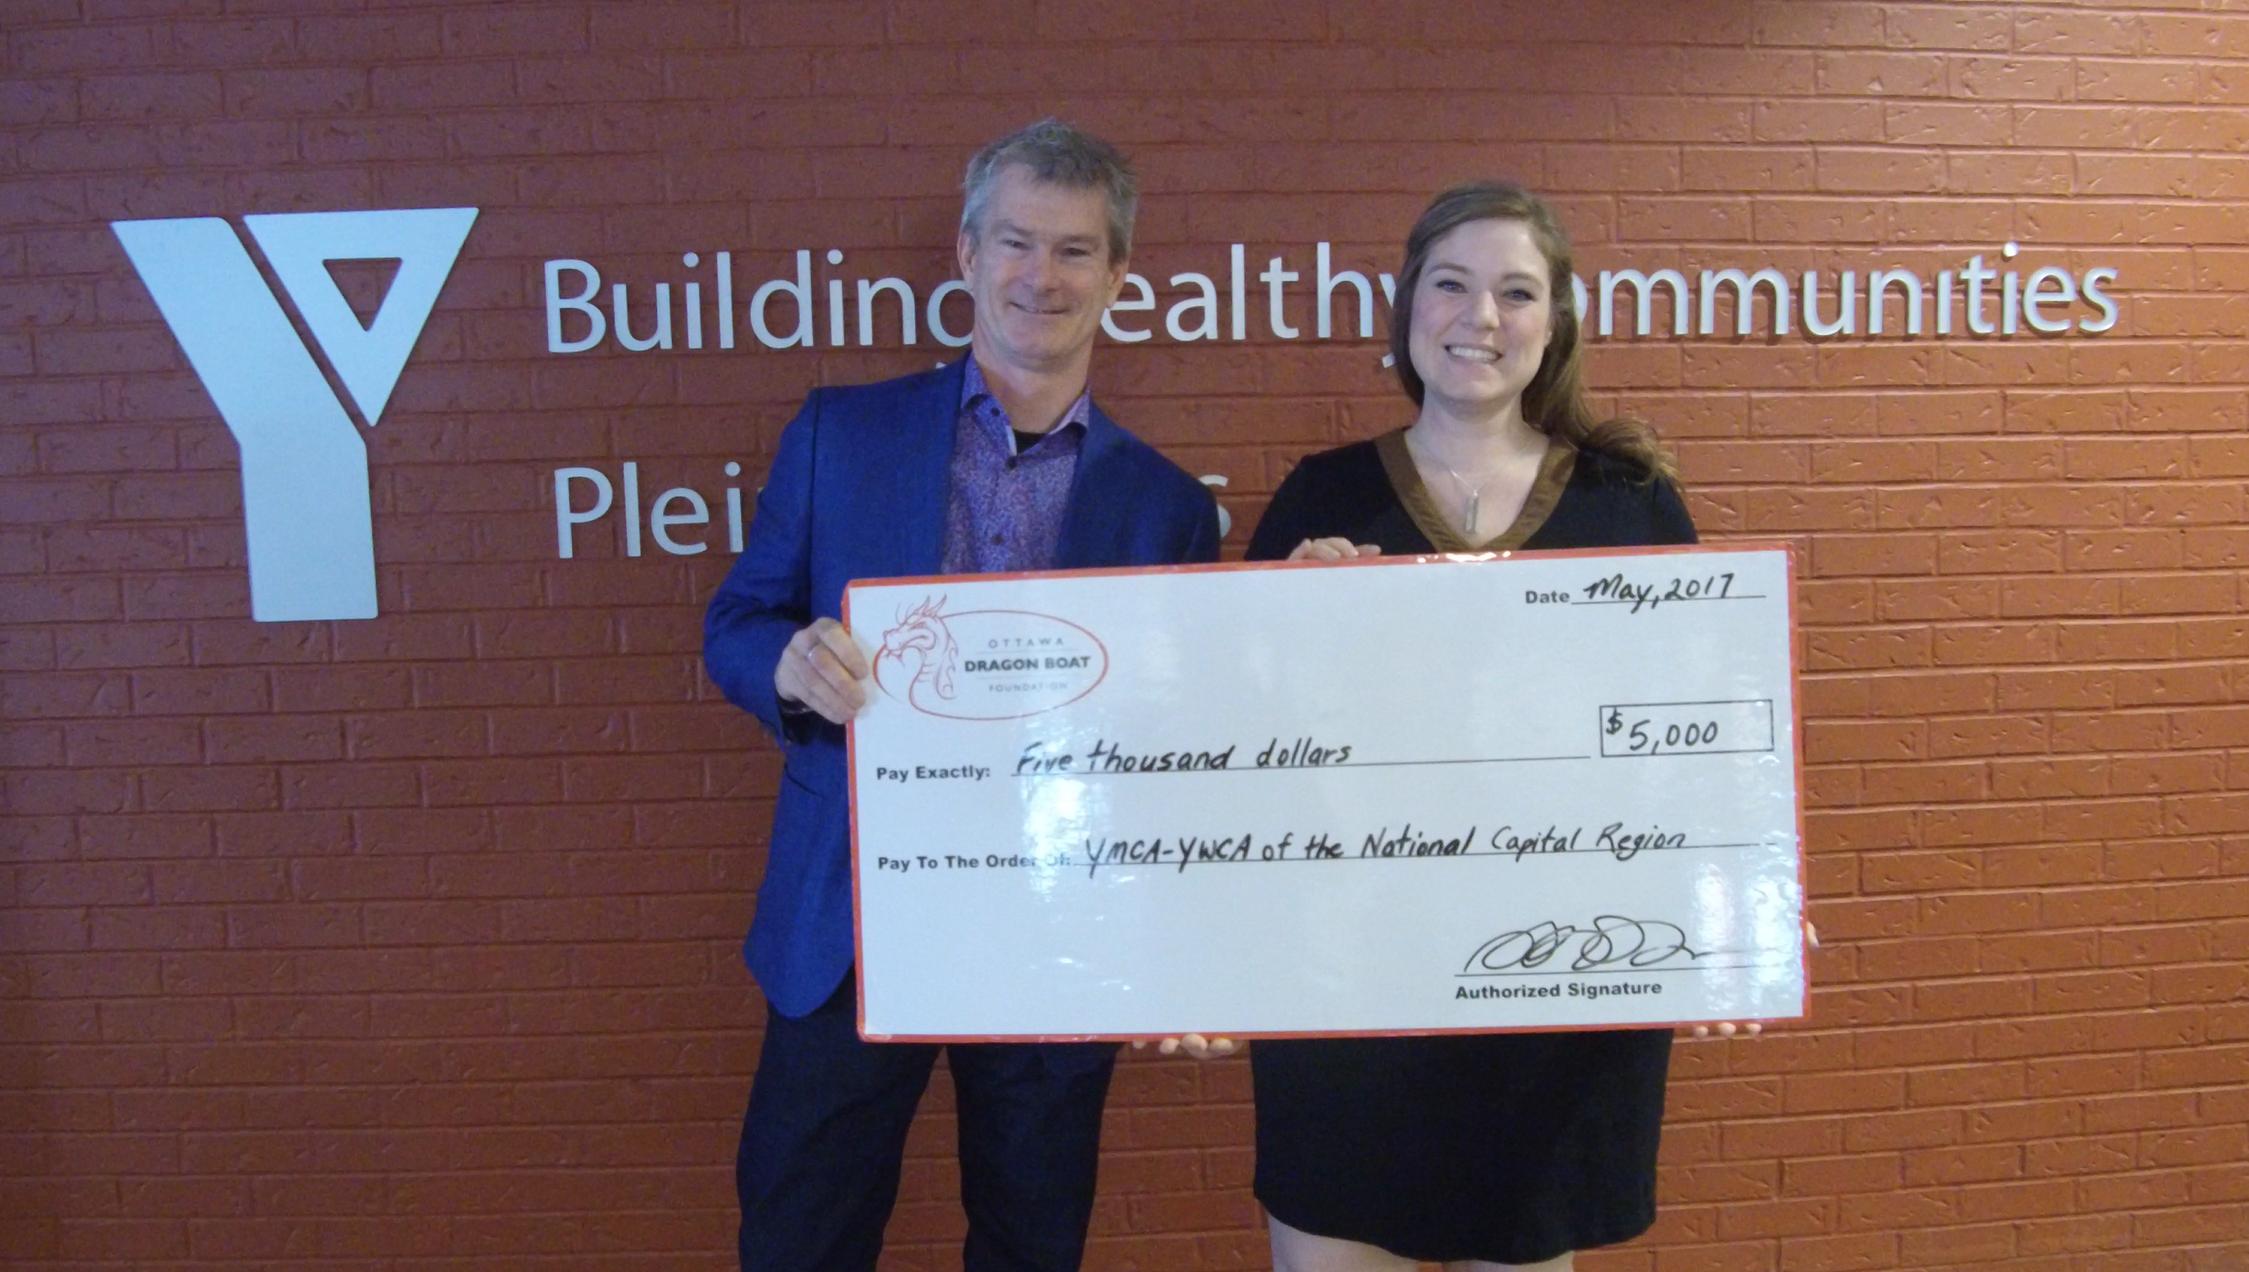 OTTAWA DRAGON BOAT FOUNDATION MAKES $5000 DONATION TO THE YMCA-YWCA OF THE NATIONAL CAPITAL REGION